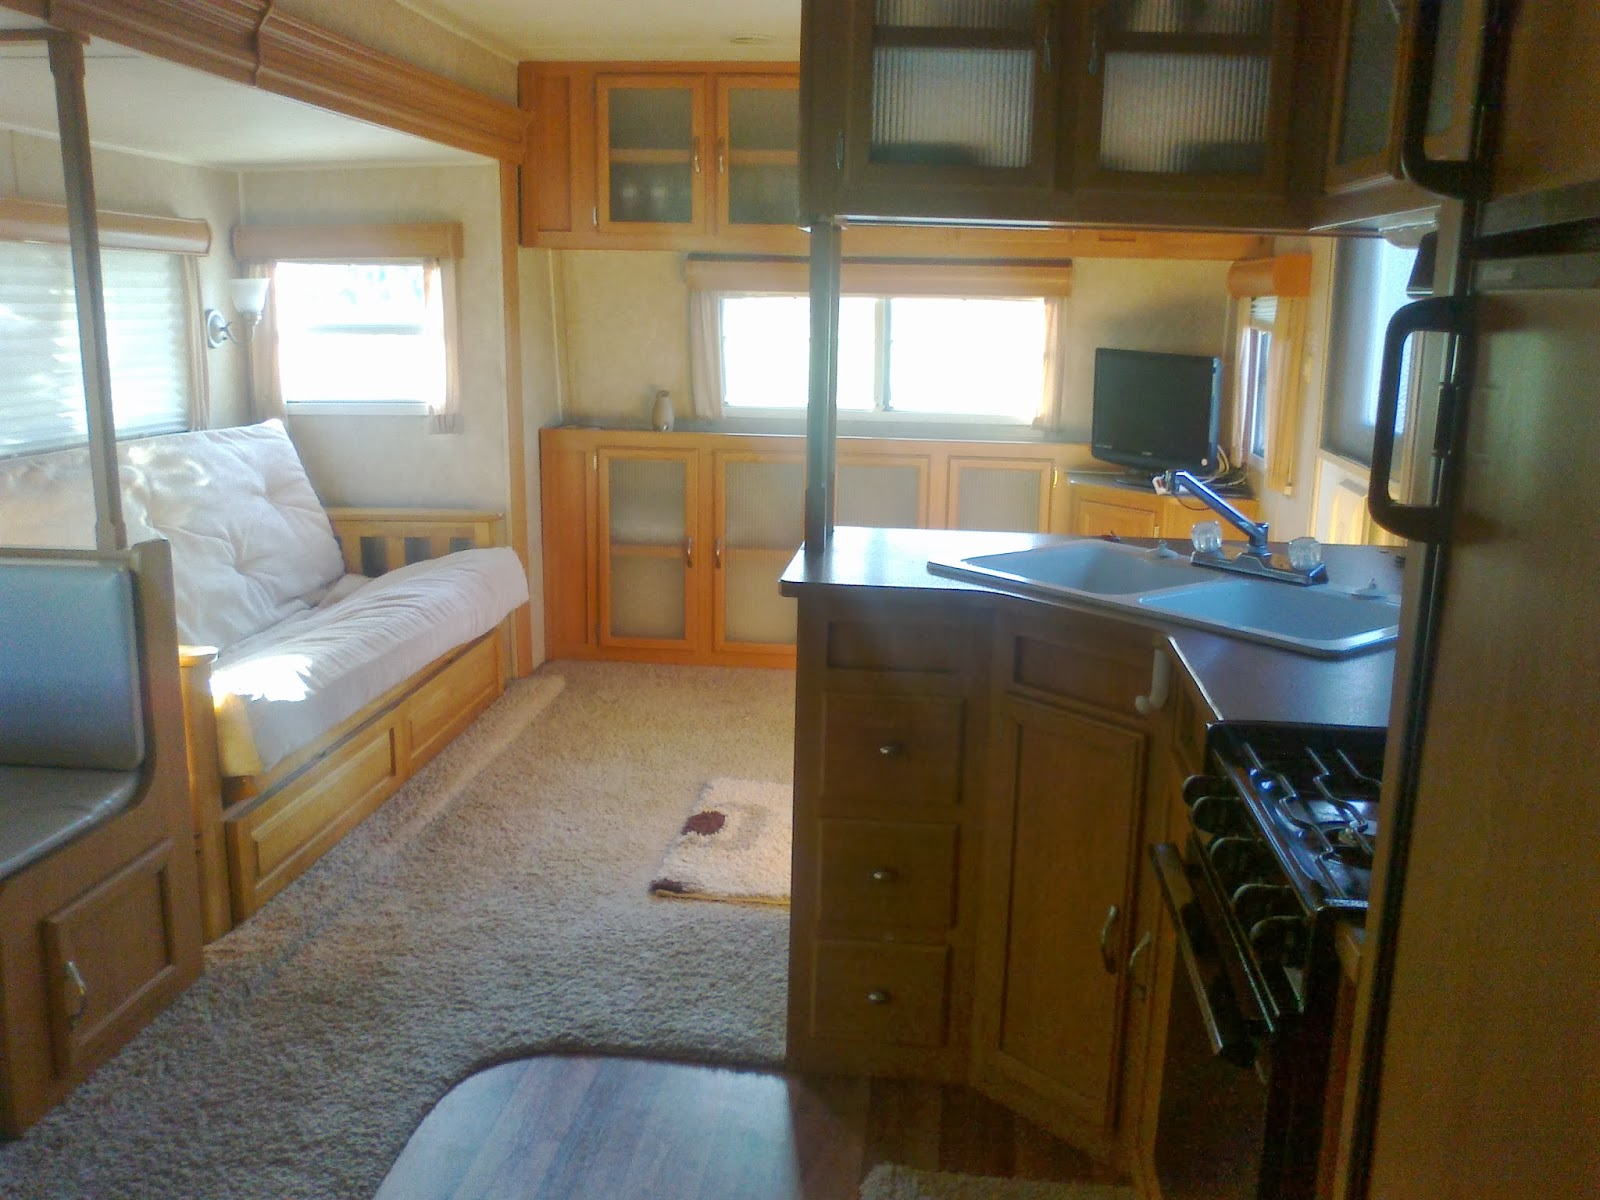 American Rv 5th Wheel Caravan And Travel Trailer Sales And Storage Costa Blanca Spain